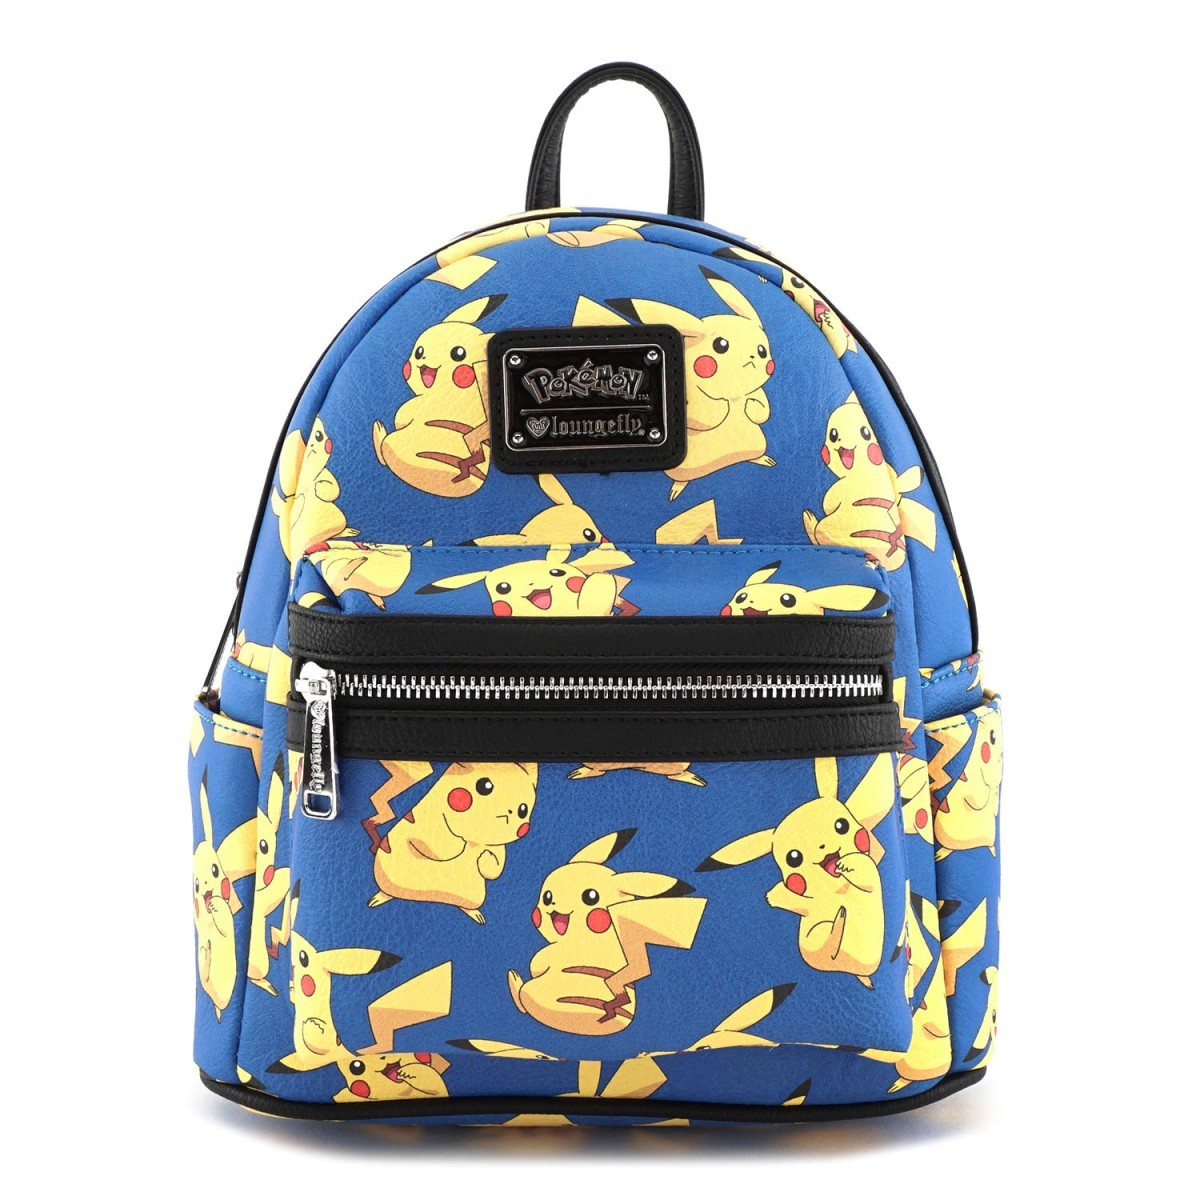 Loungefly Pokemon Pikachu Mini Backpack image